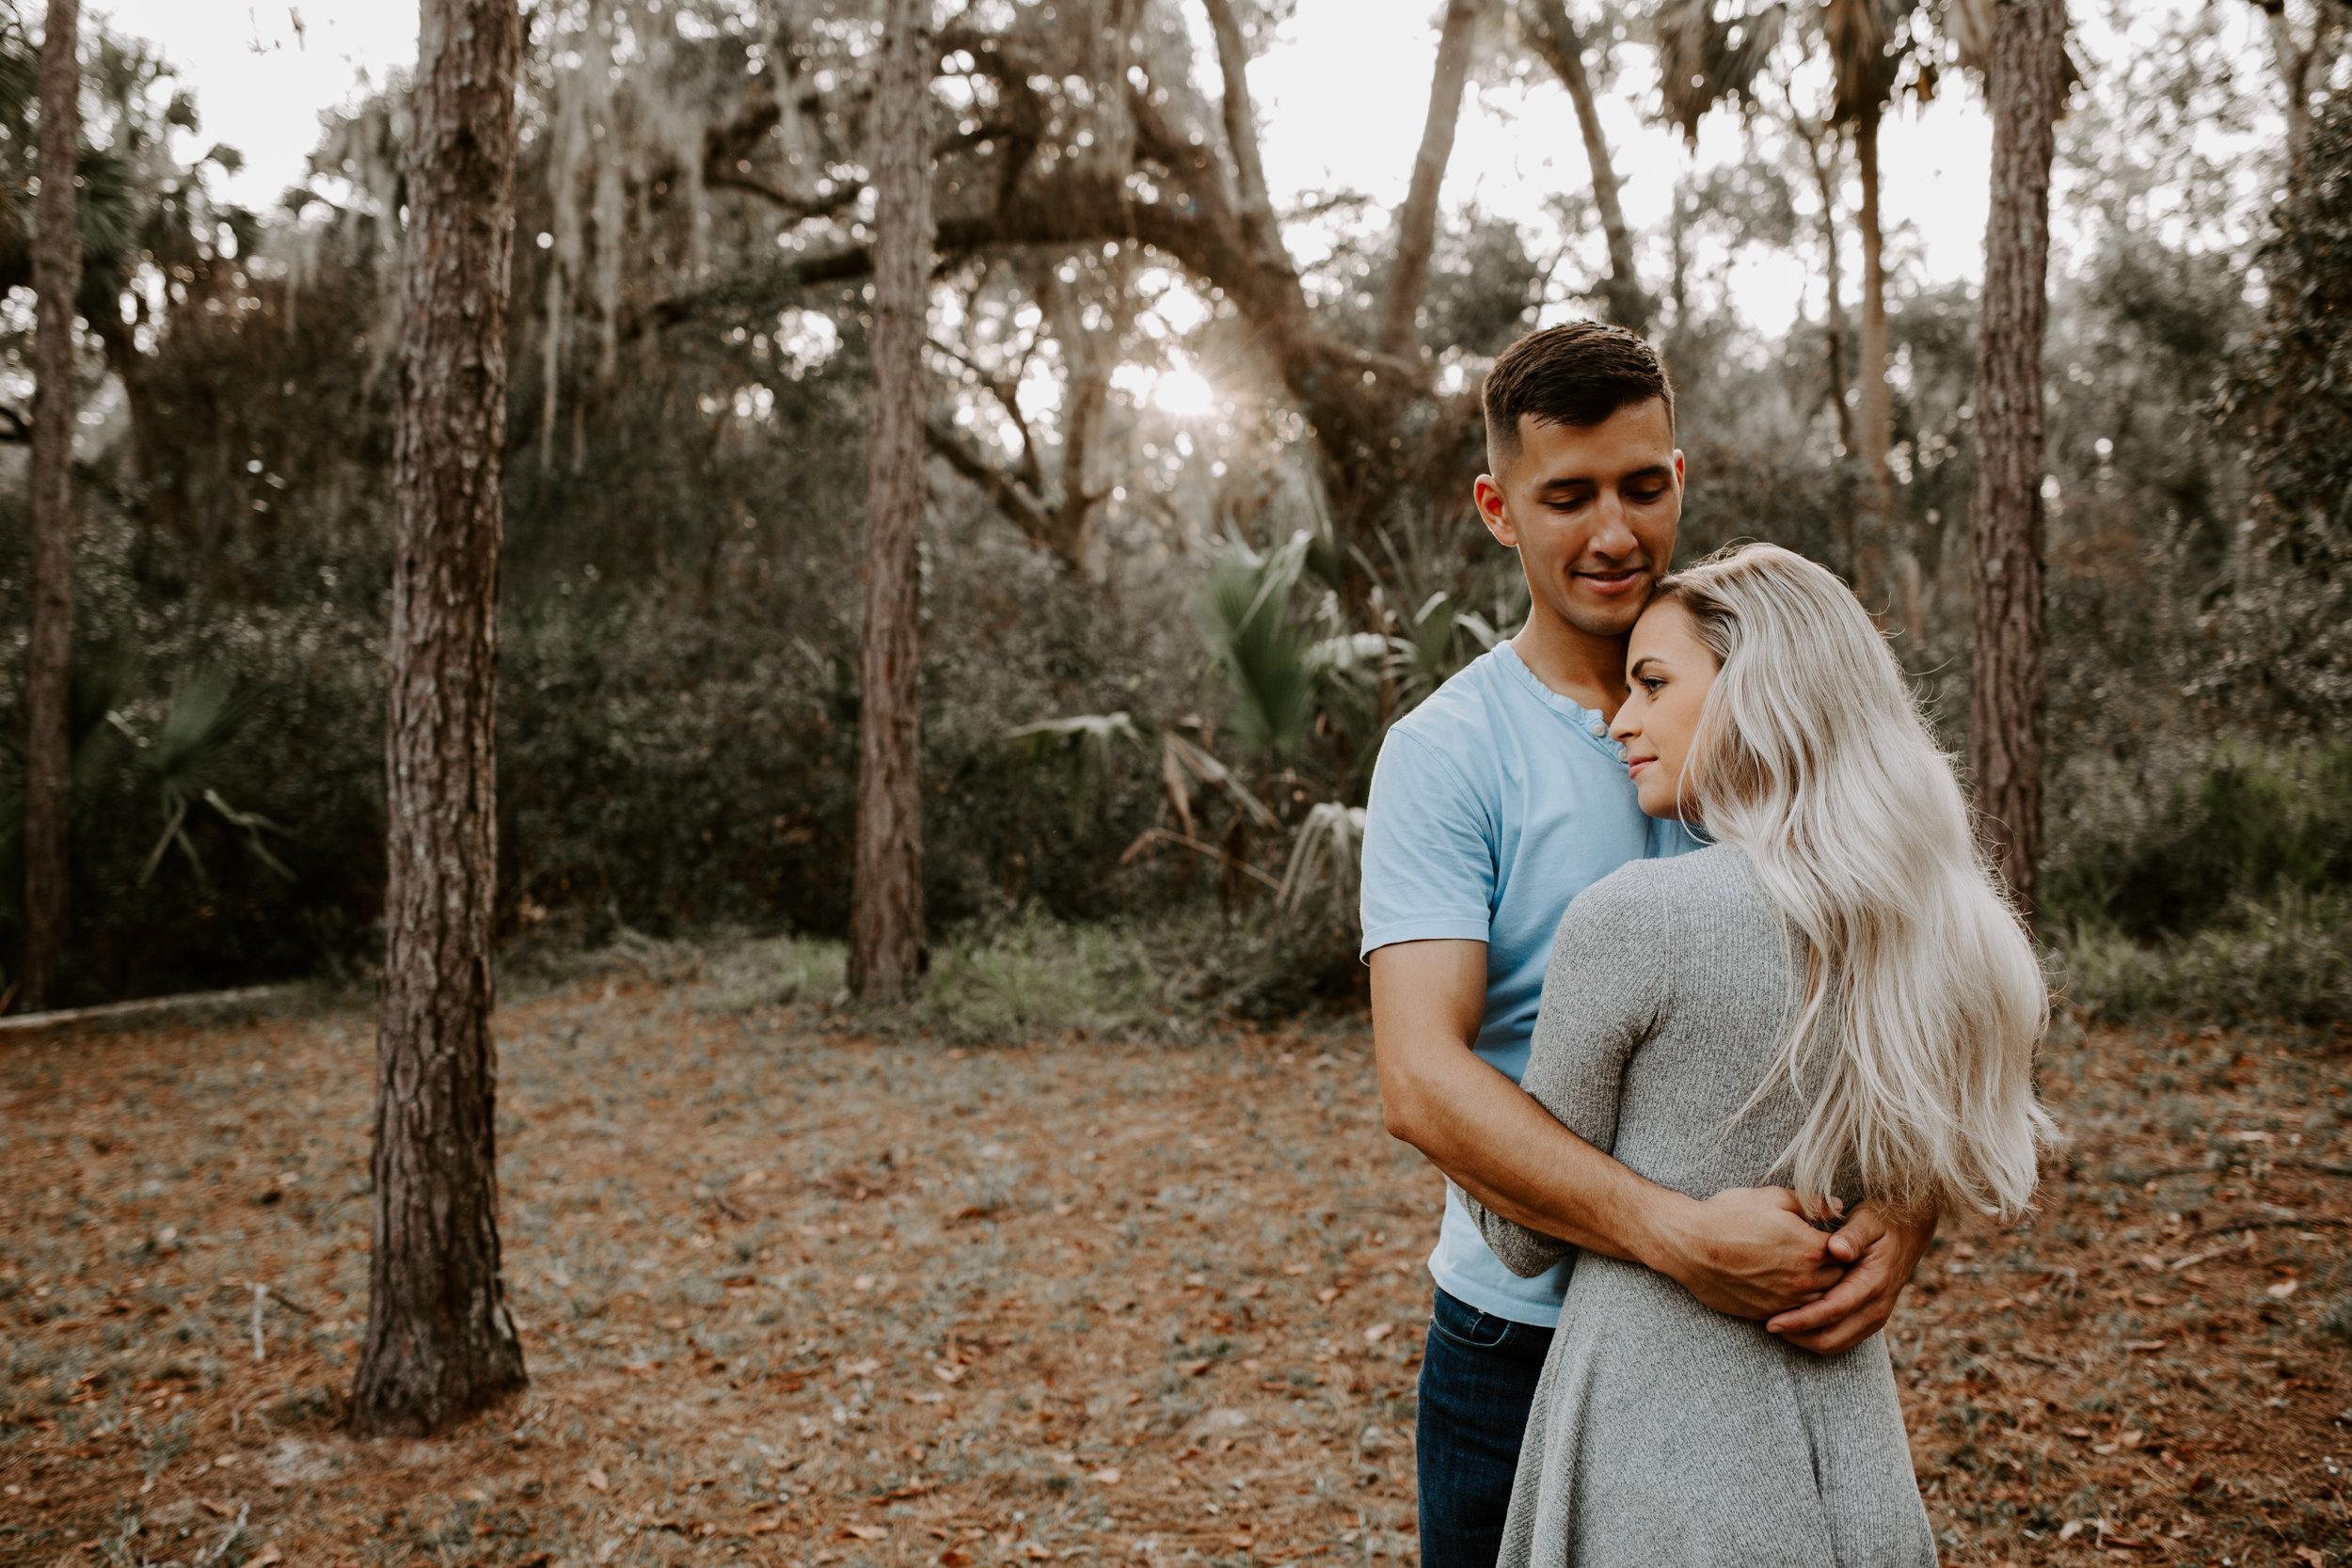 Zach&Jaclyn-Engagement-PHOTOSWITHJILL-182.jpg